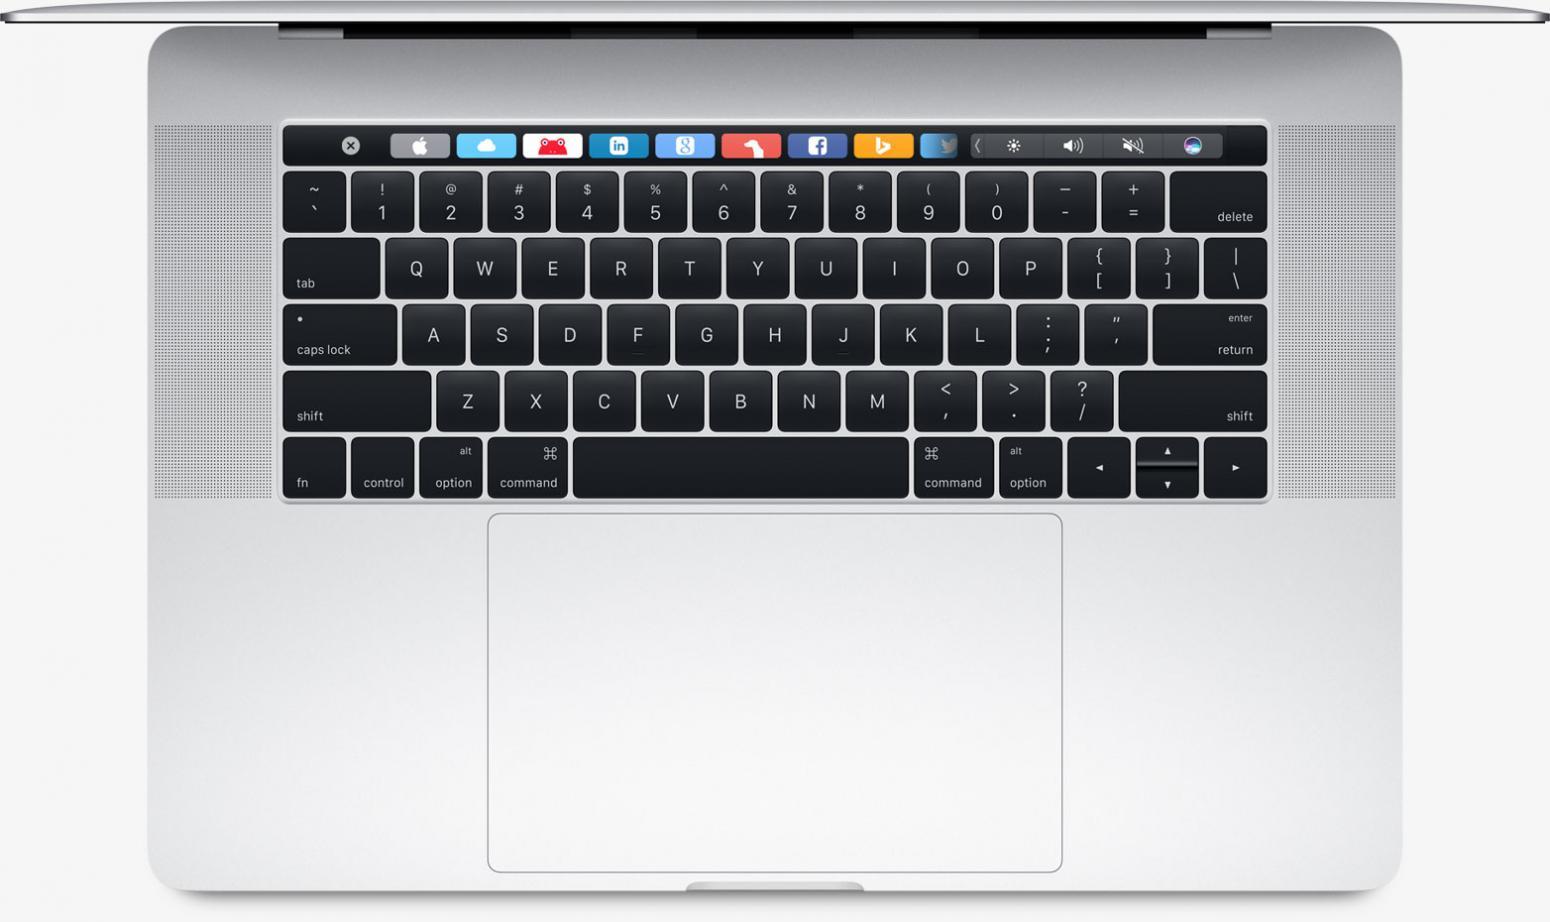 apple macbook pro retina 15 avec touch bar 2016 les. Black Bedroom Furniture Sets. Home Design Ideas